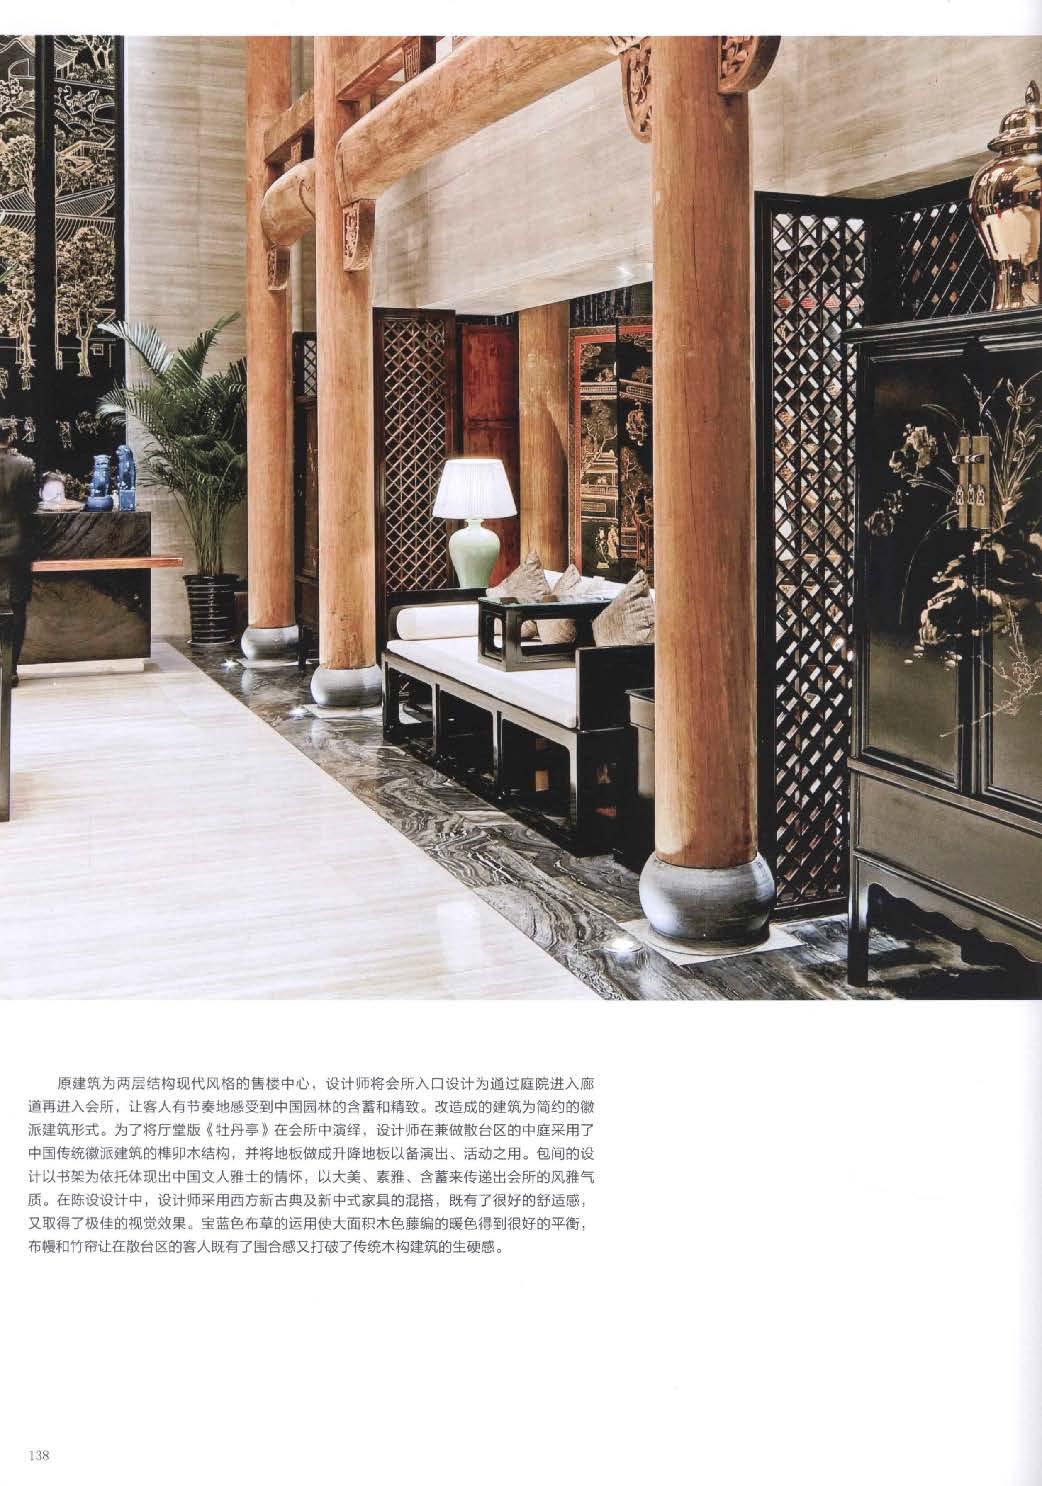 H073 东方风情 会所、餐饮细部解析_Page_136.jpg